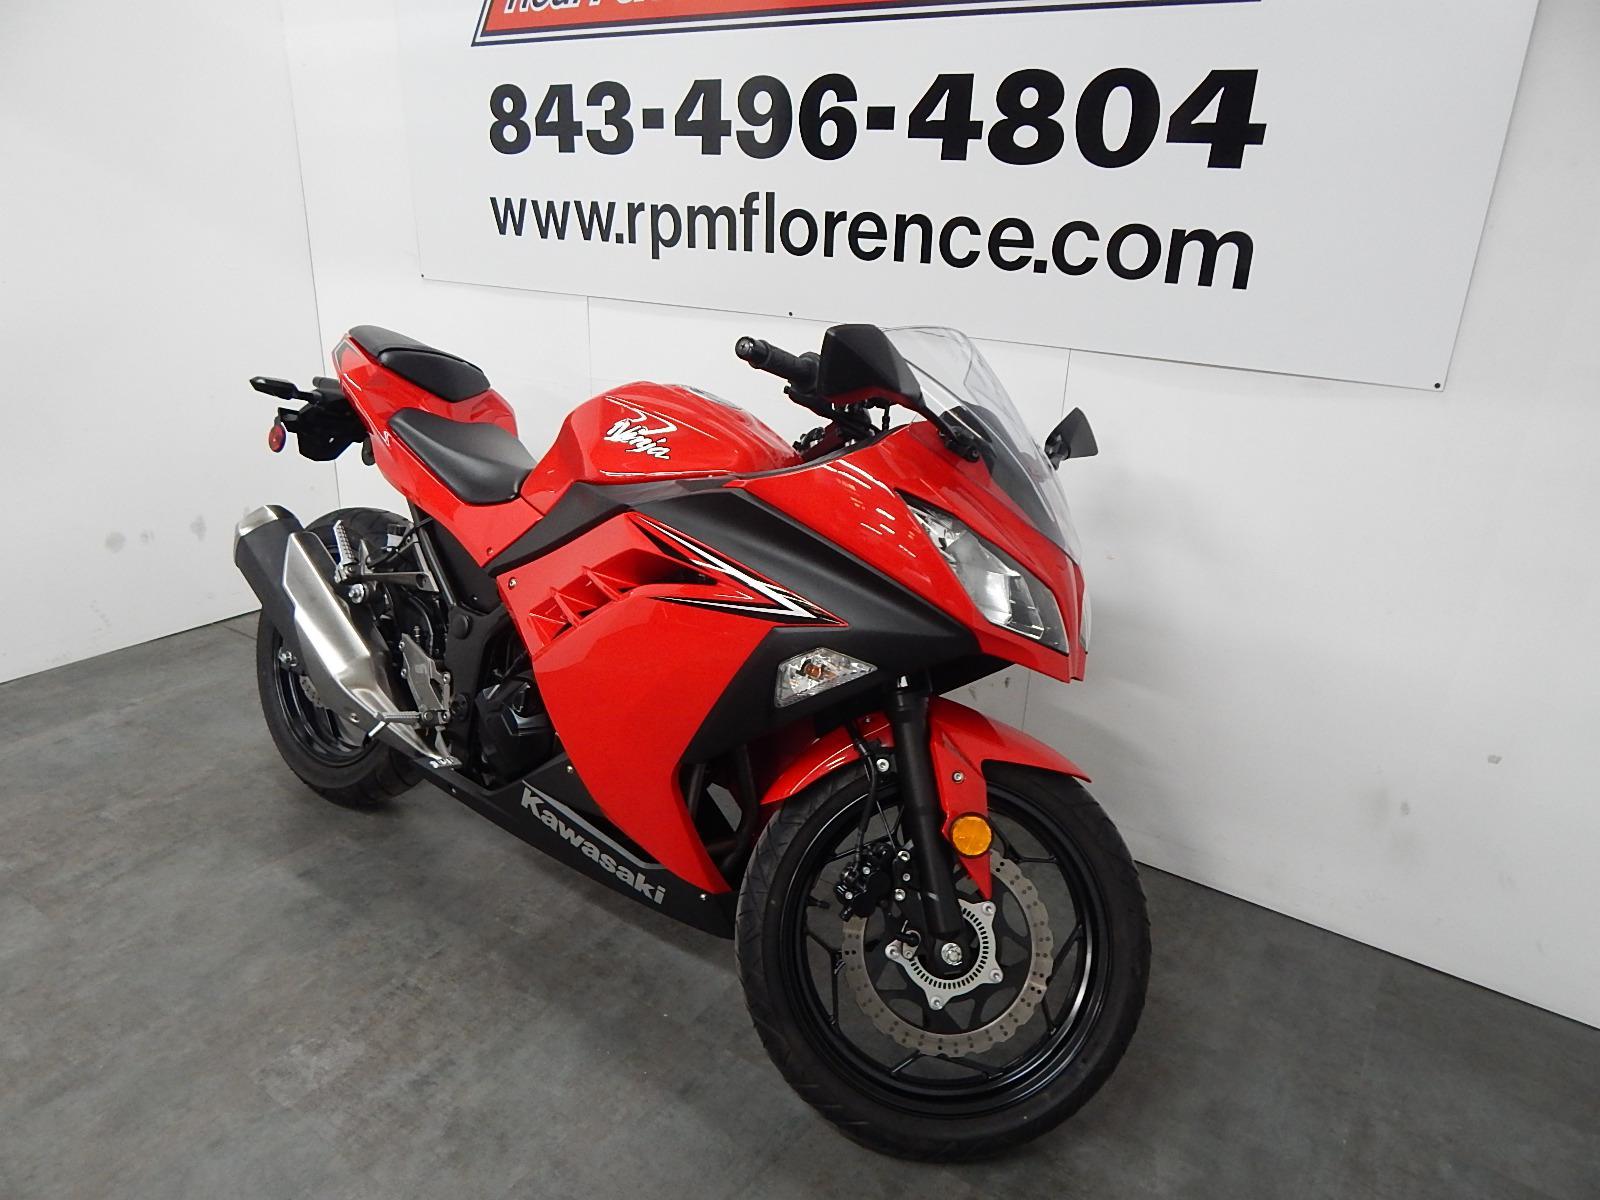 2016 Kawasaki Ninja 300 Abs For Sale In Florence Sc Real